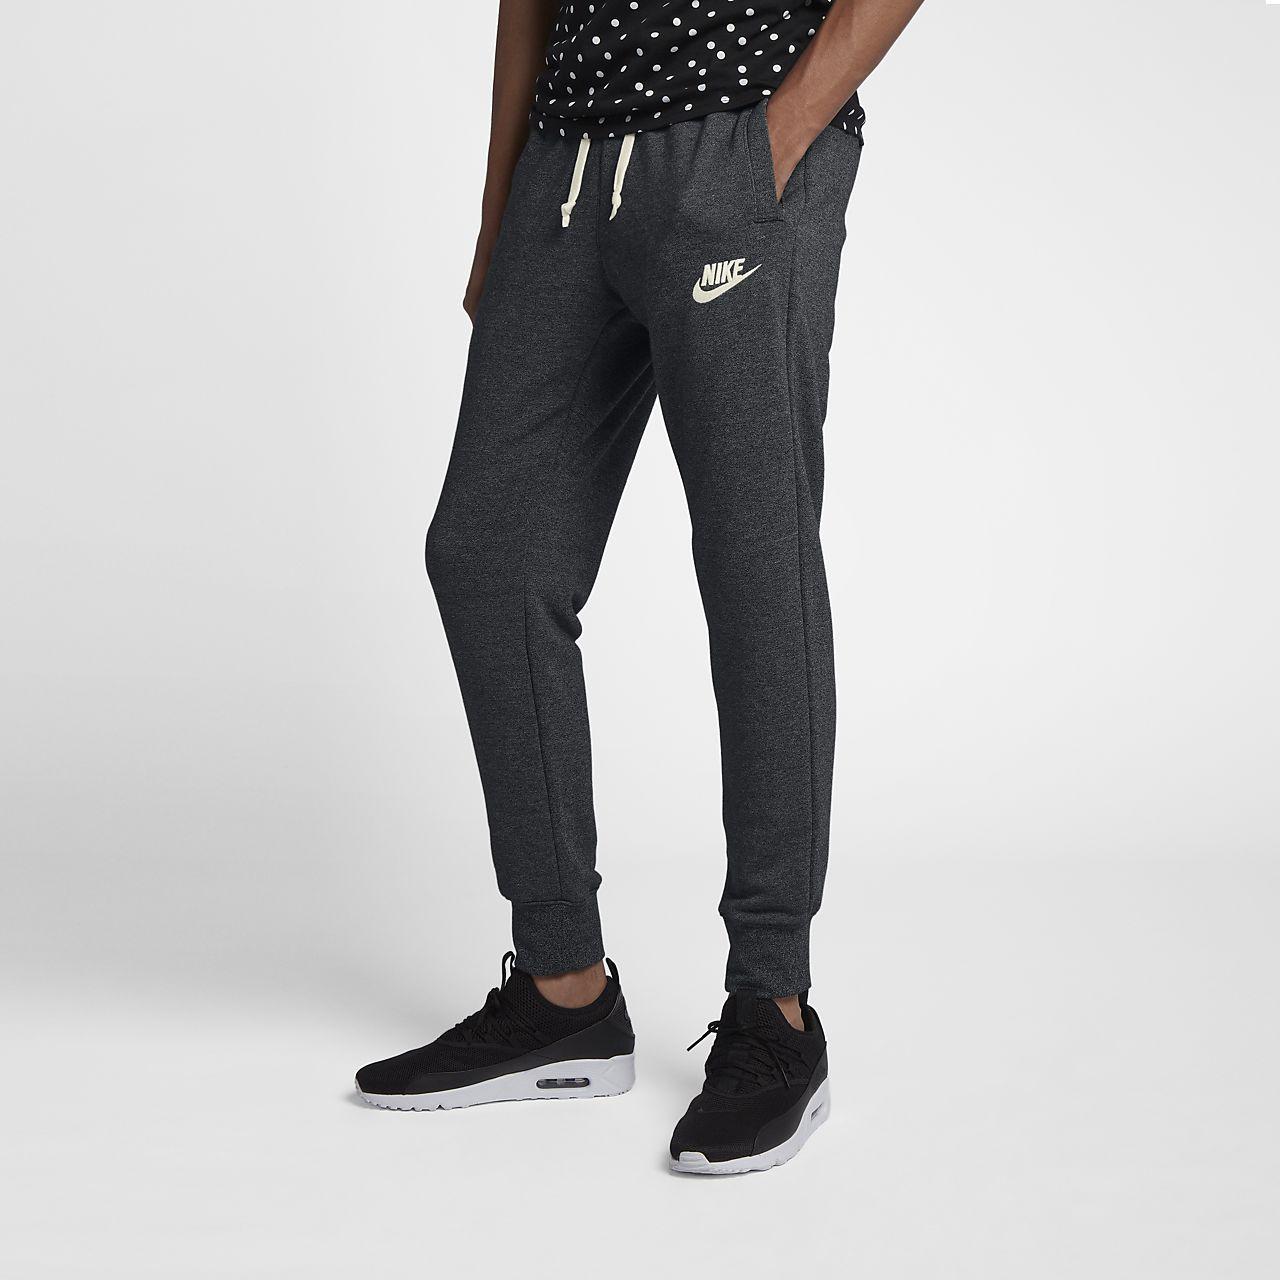 De Ca Nike Jogging Pantalon Homme Heritage Pour Sportswear wxqa6dz6H